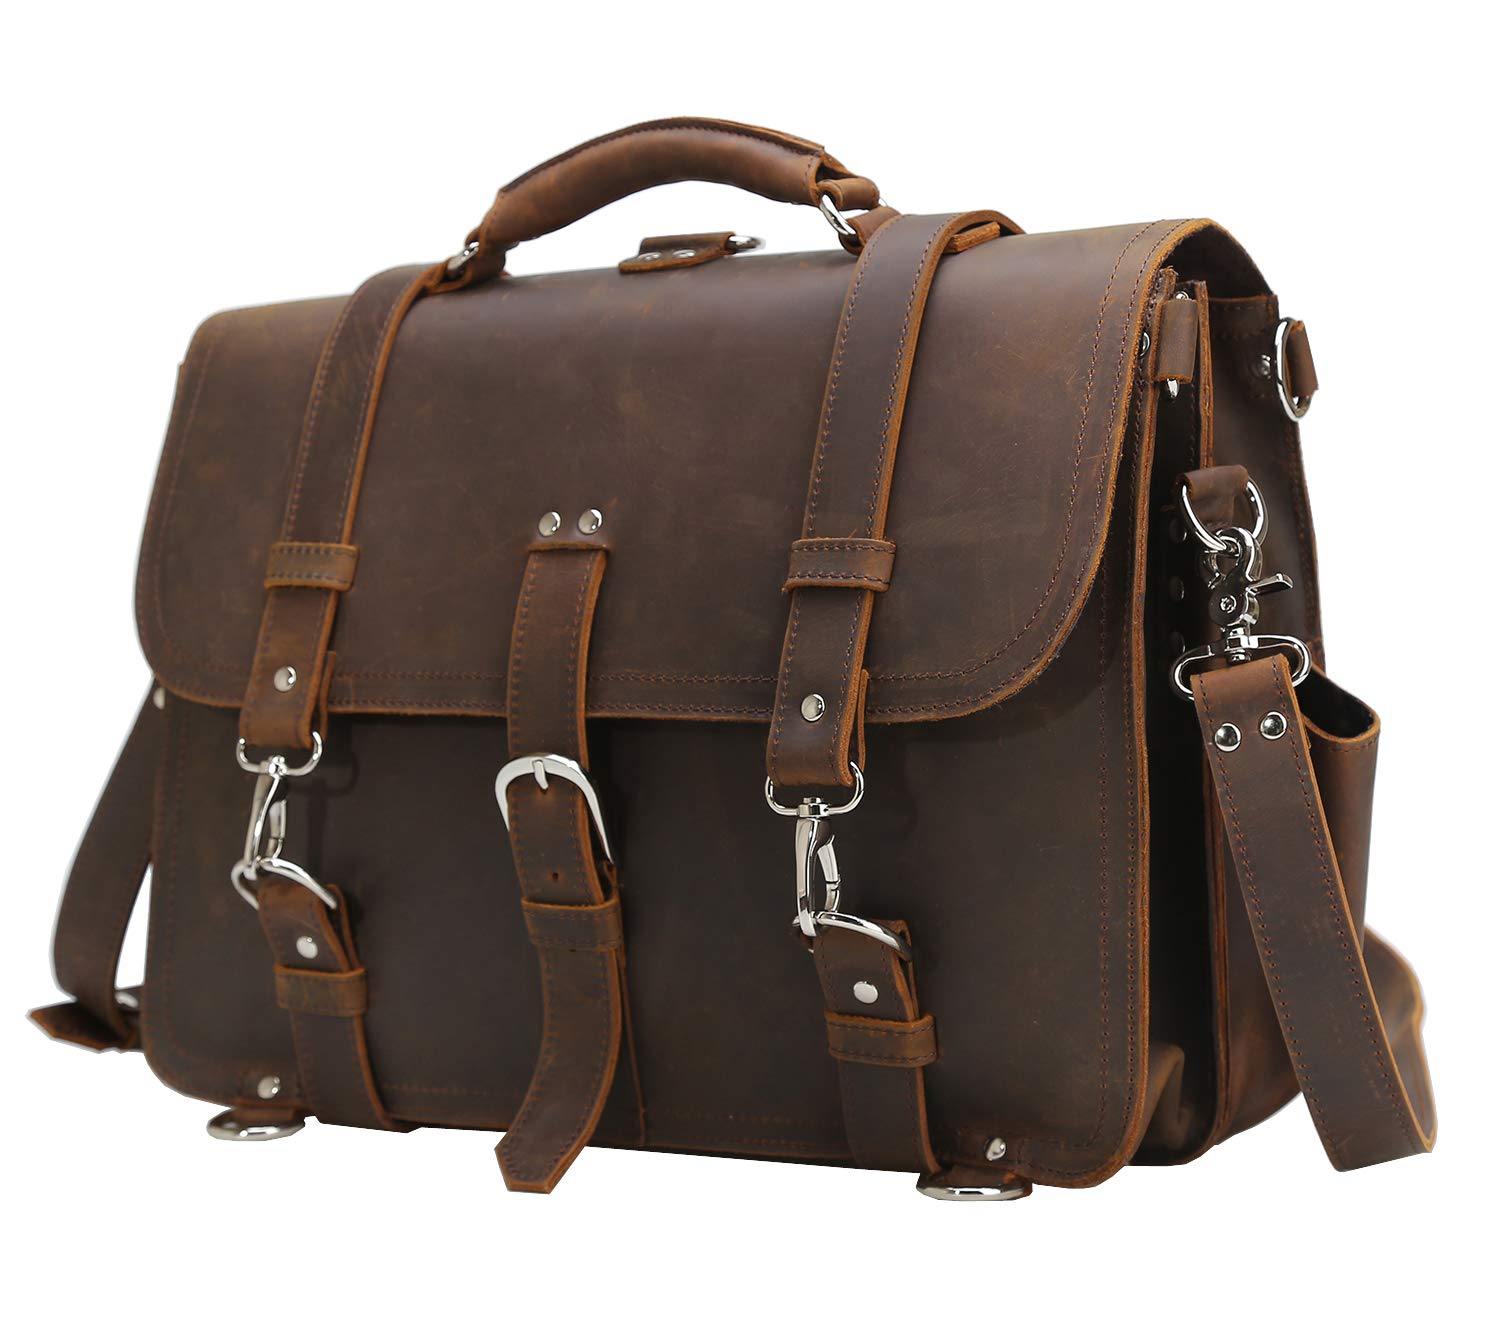 Polare Men's Full Grain Leather 16'' Laptop Briefcase Shoulder Messenger Bag by Polare (Image #2)